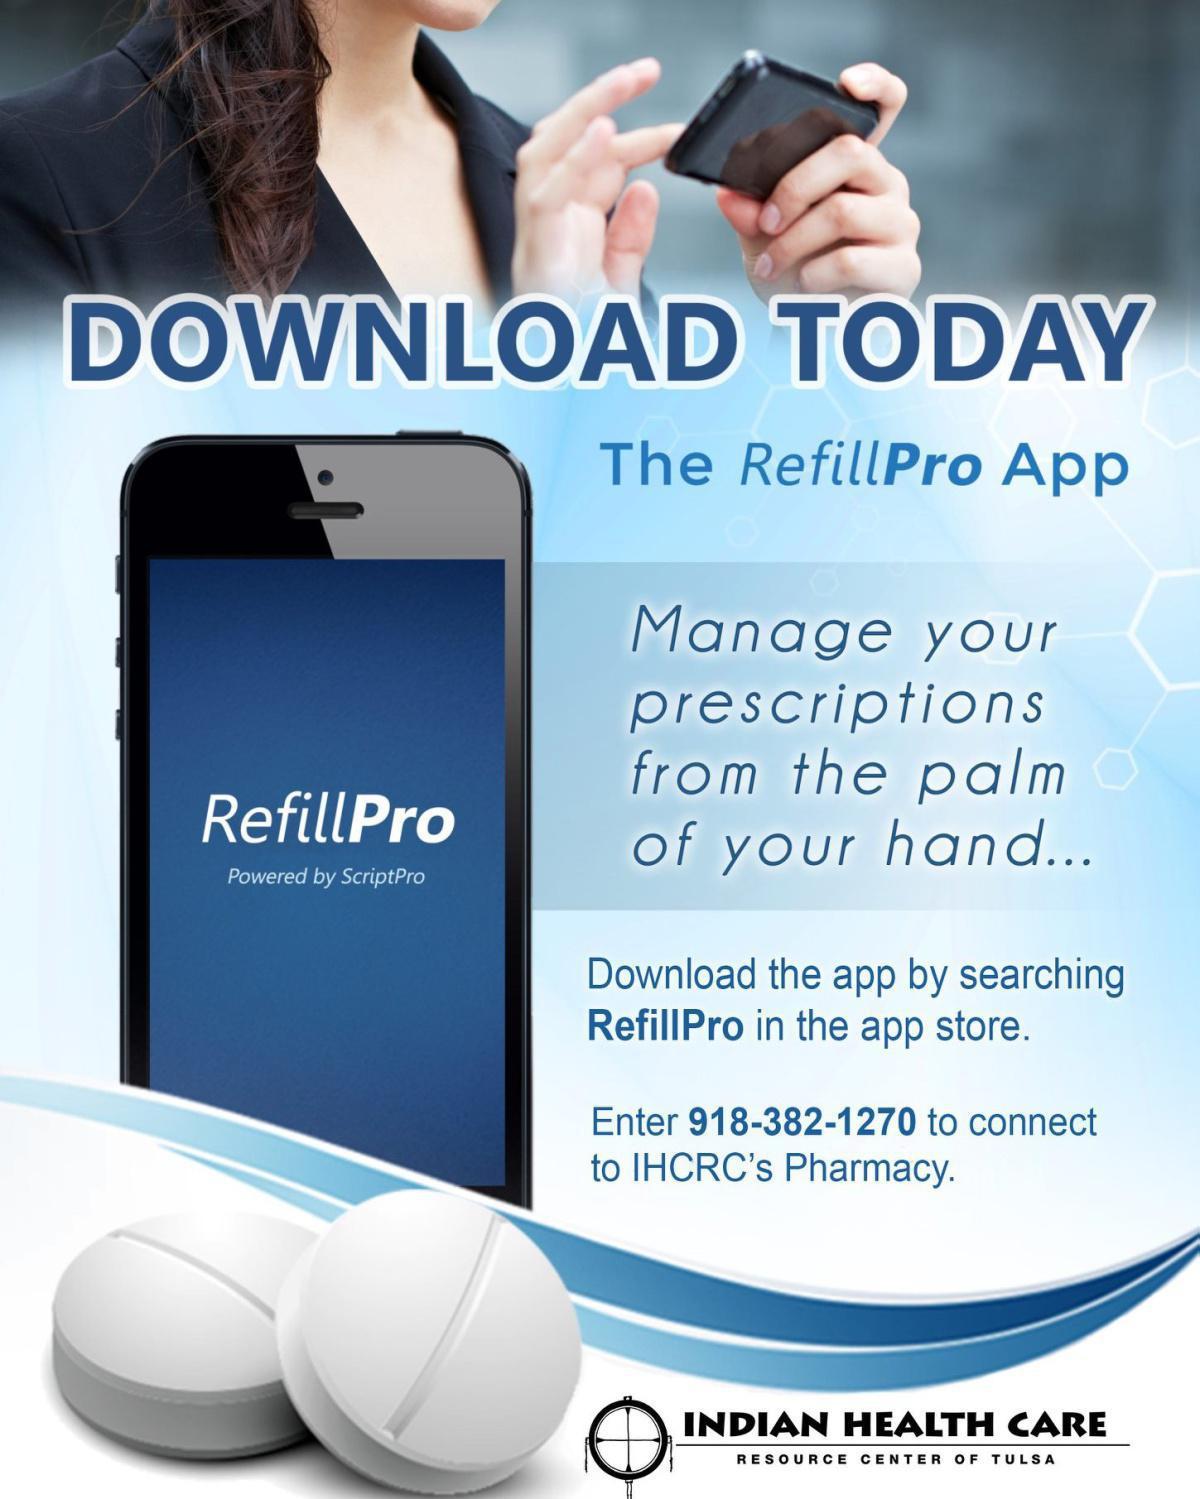 Make Pharmcy Refills Easy, Download Our App